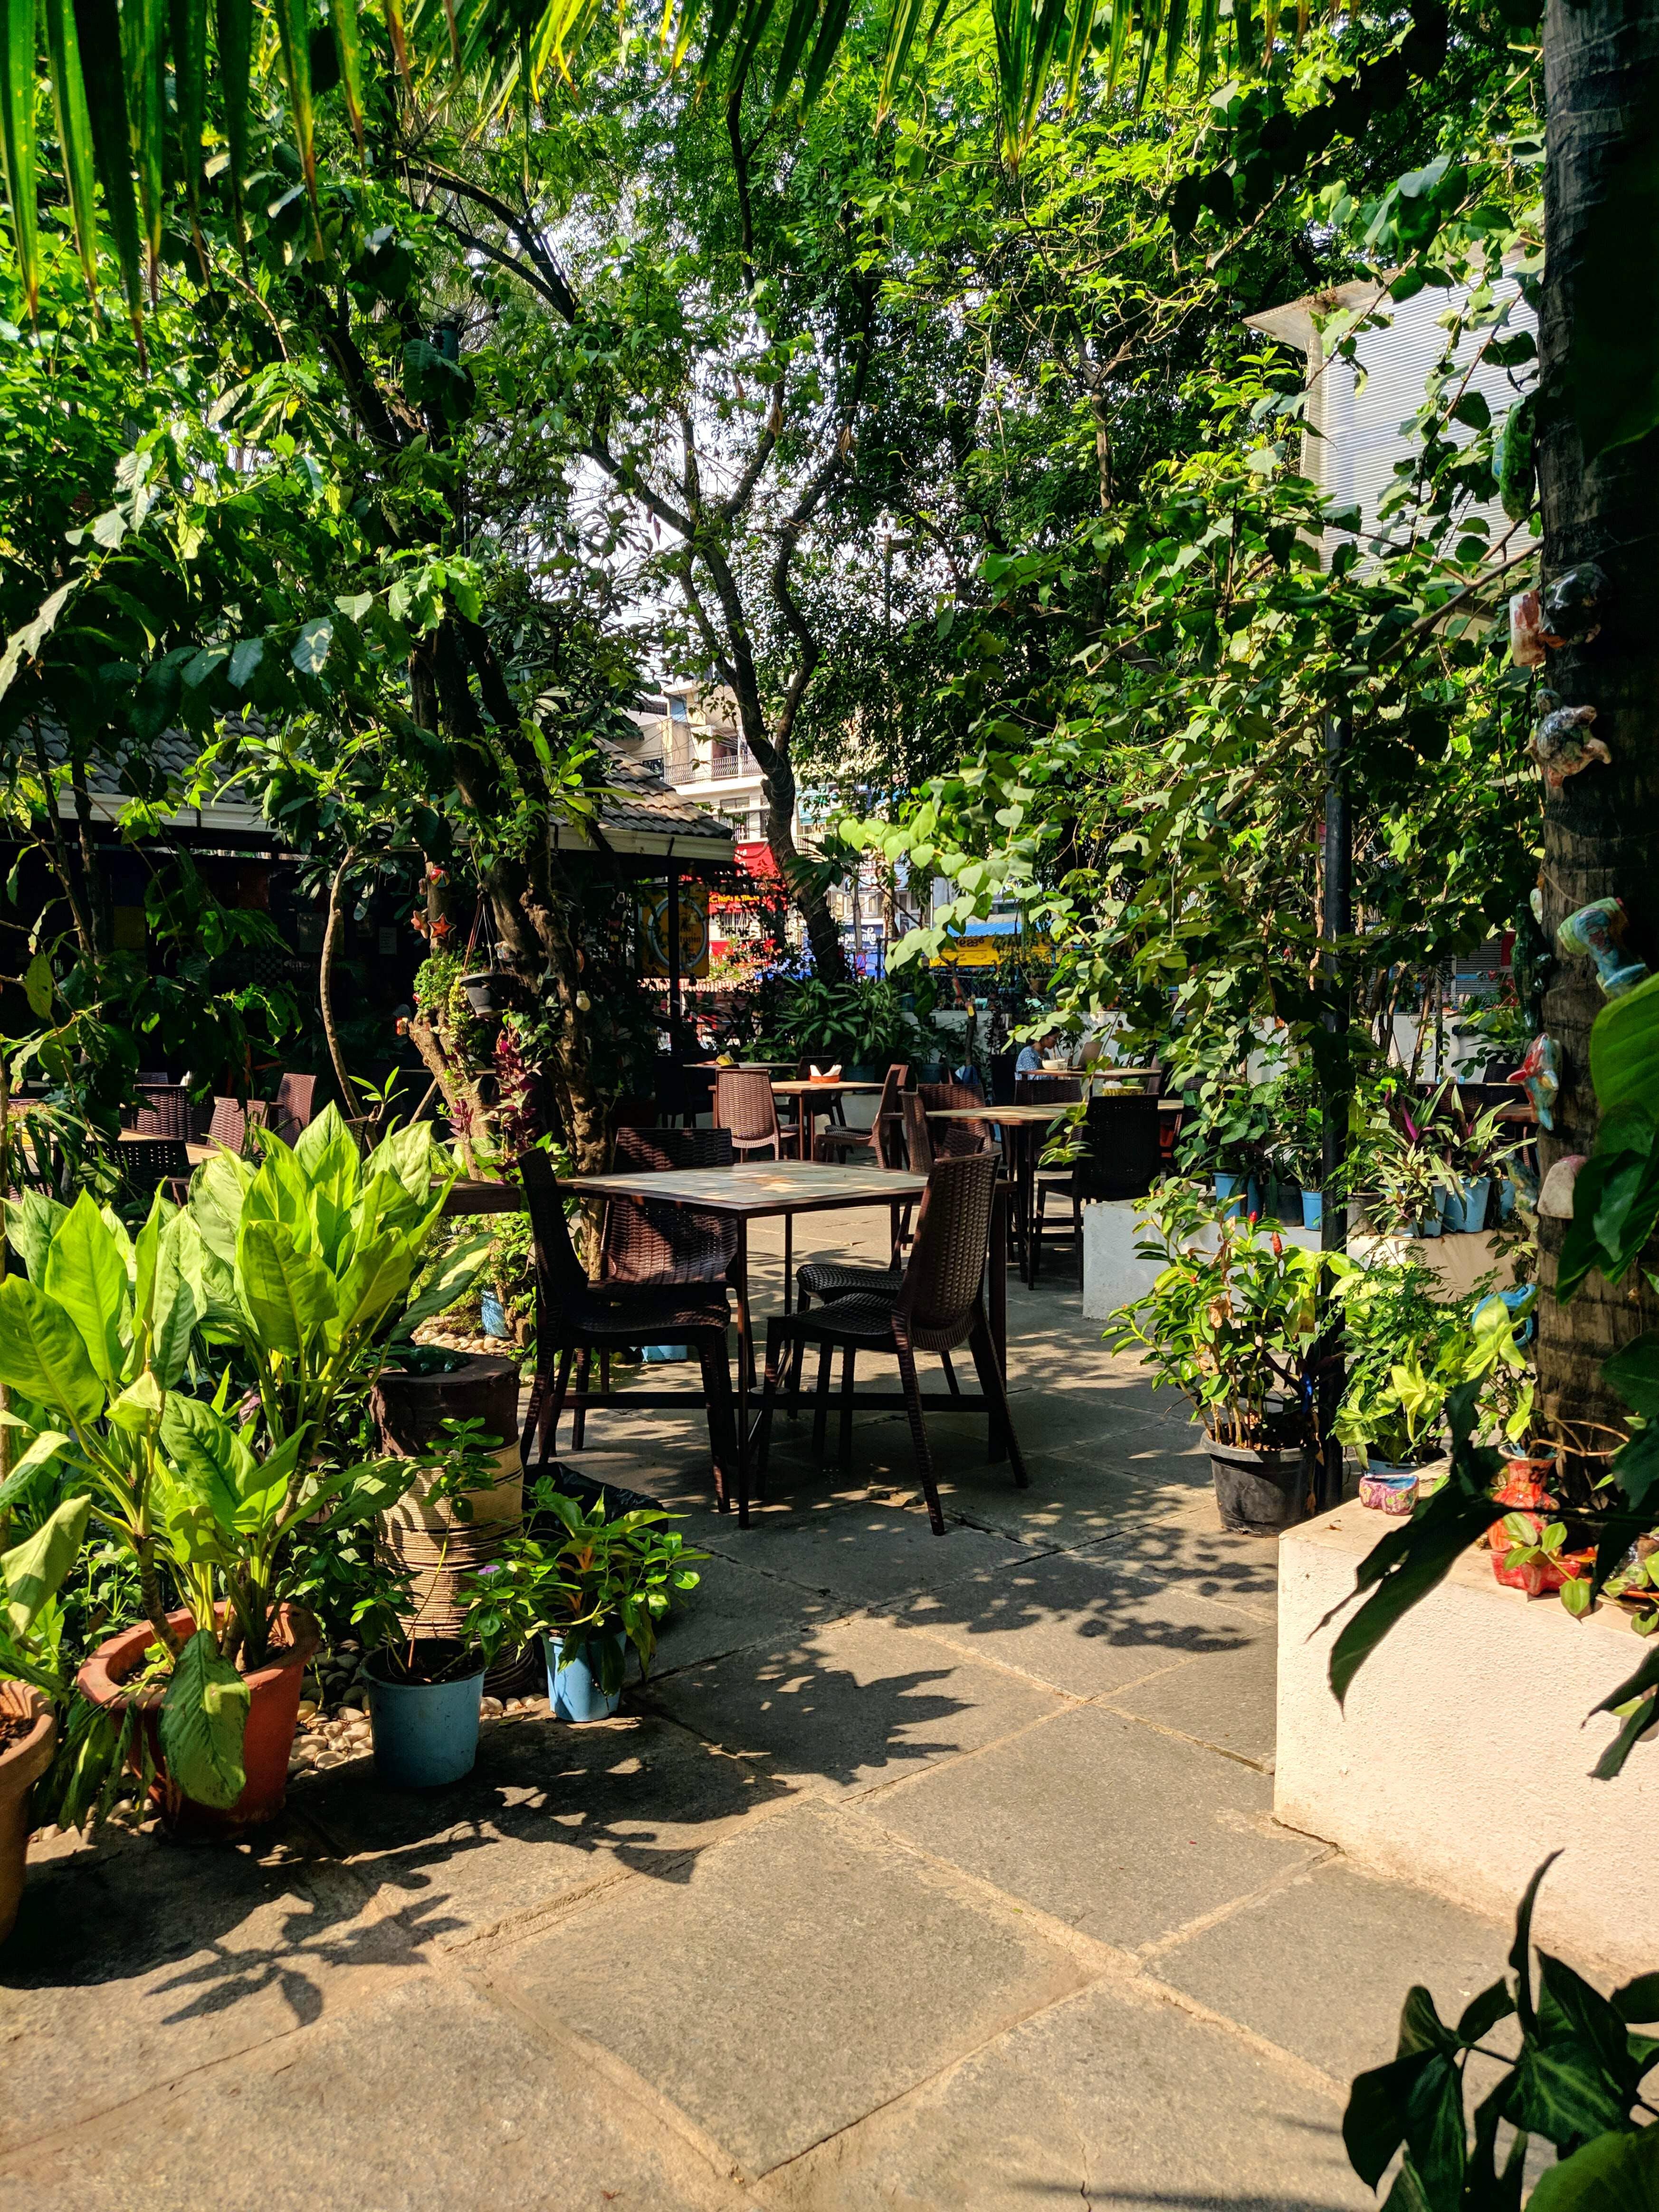 Vegetation,Garden,Botany,Tree,Botanical garden,Plant,Spring,Courtyard,Landscaping,Furniture